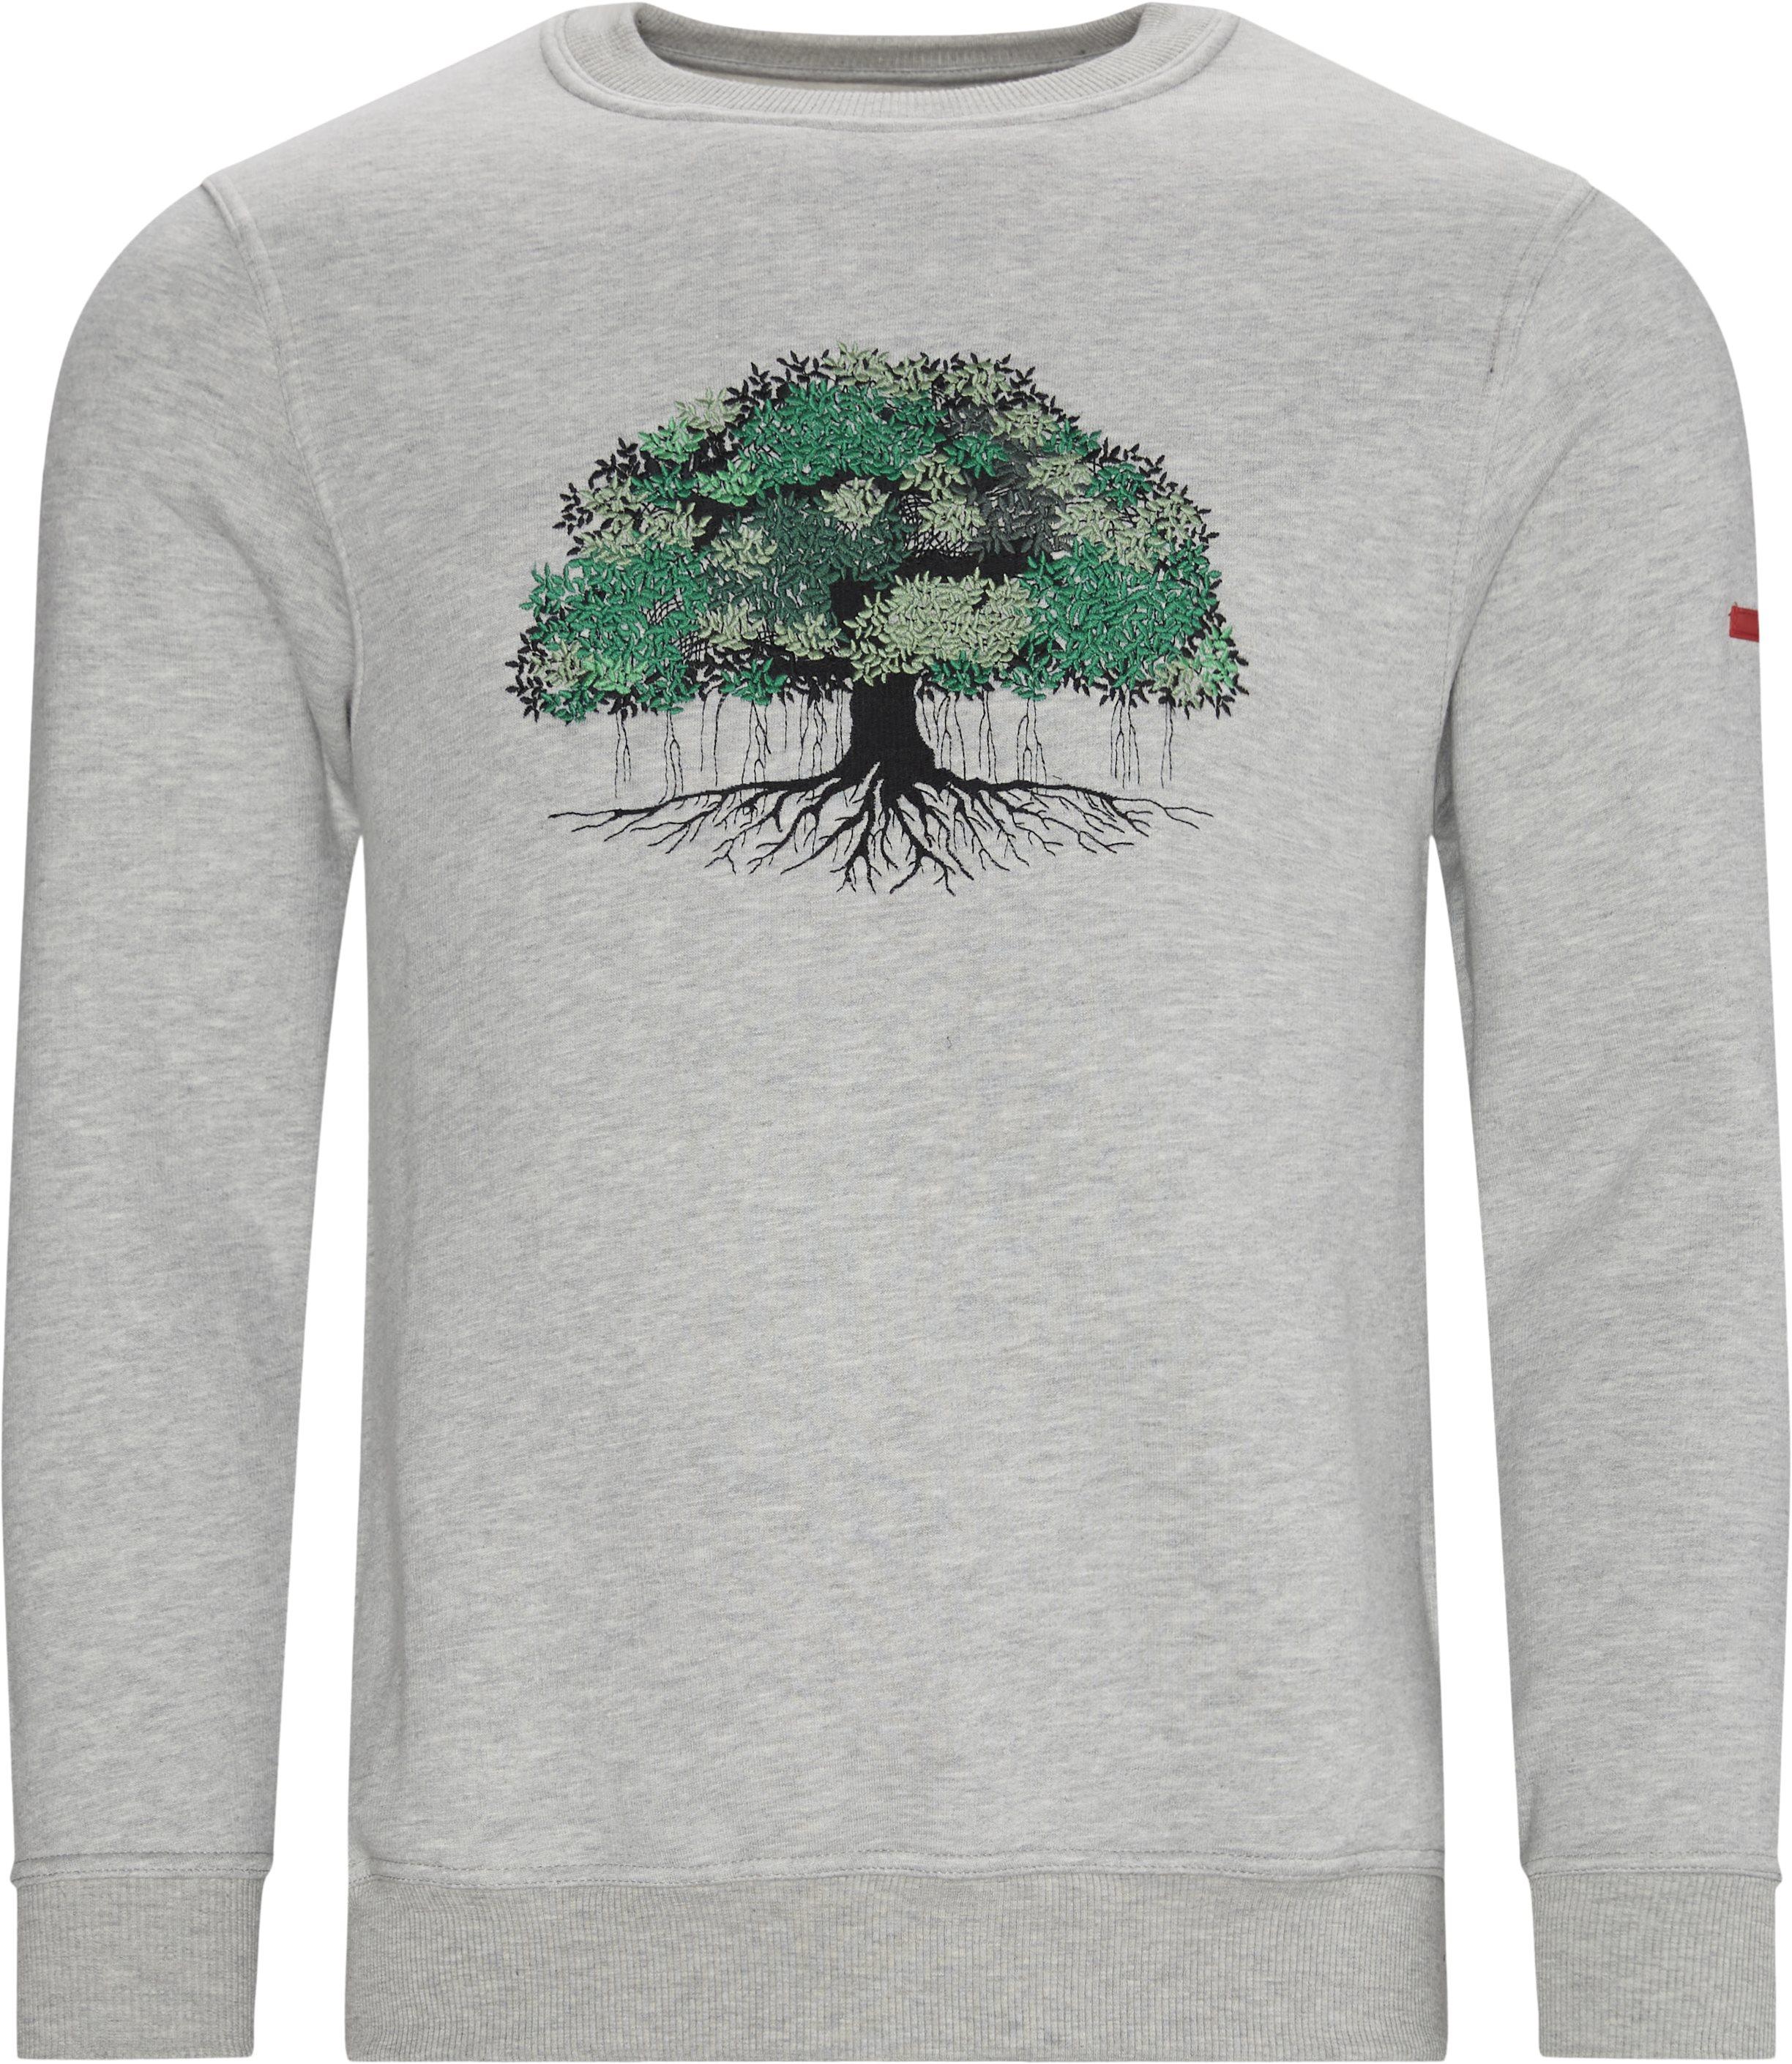 Tree Crewneck Sweatshirt - Sweatshirts - Regular - Grå